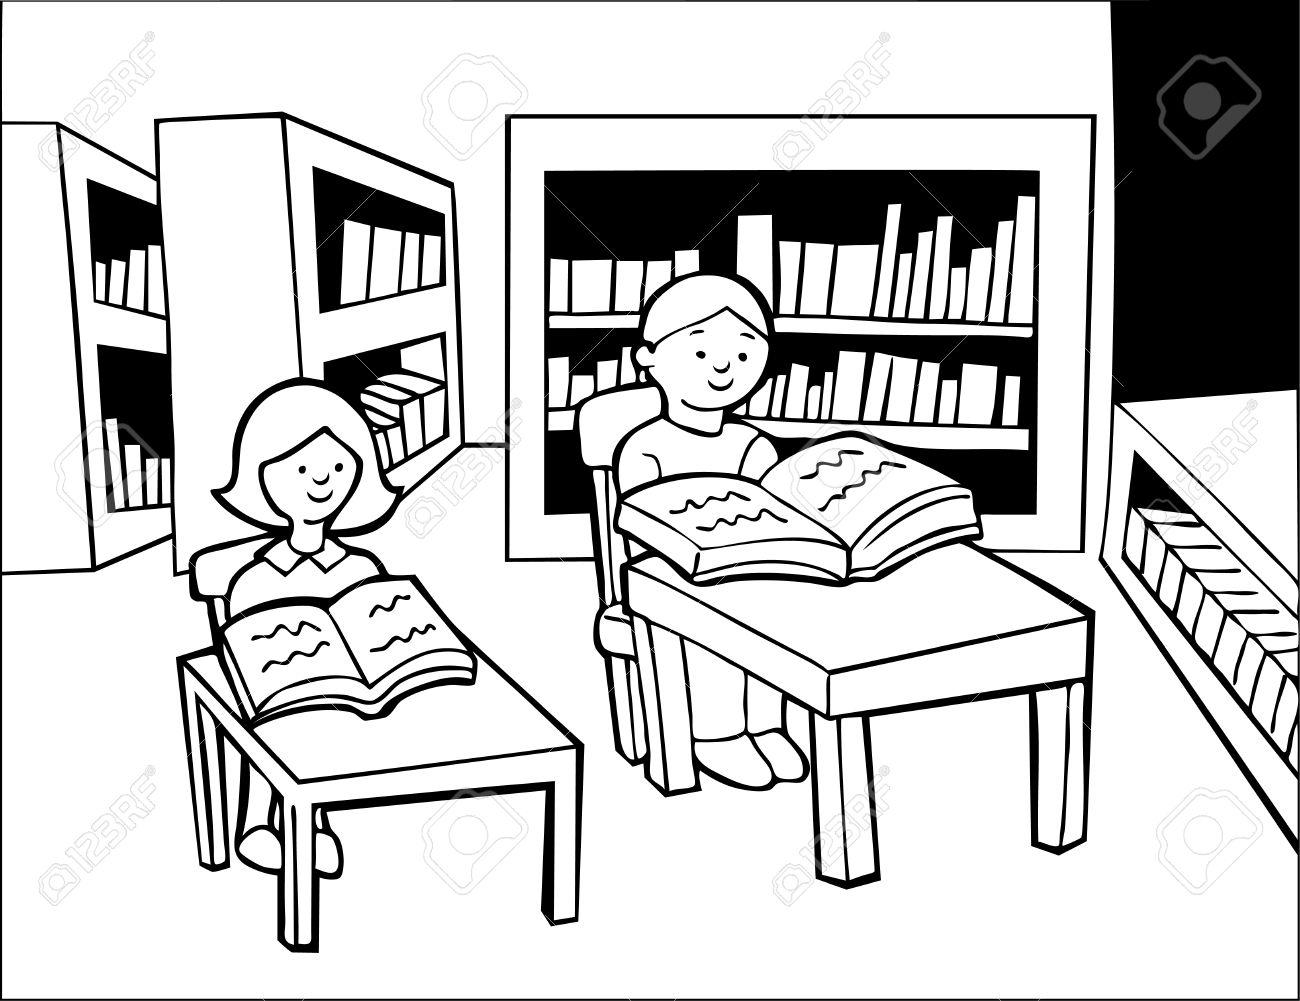 Children Library Reading Line Art Boy And Girl Sitting At Desks